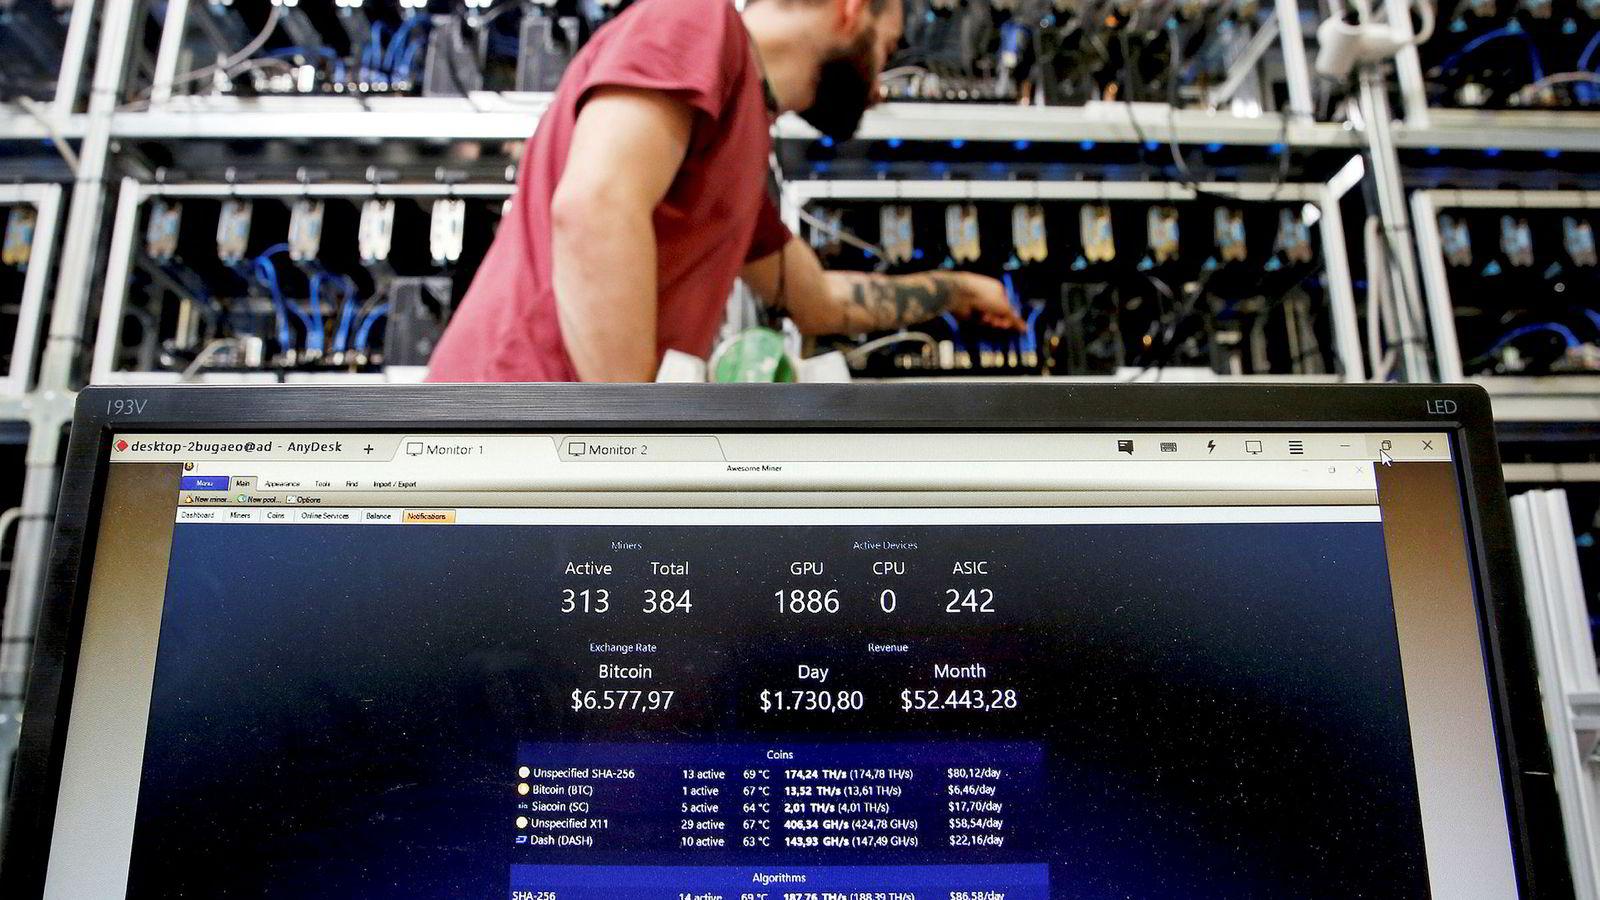 En vesentlig årsak til at kryptovalutaer ikke egner seg som elektroniske kontanter, er at de varierer så voldsomt i verdi, skriver DN-kommentator Terje Erikstad.